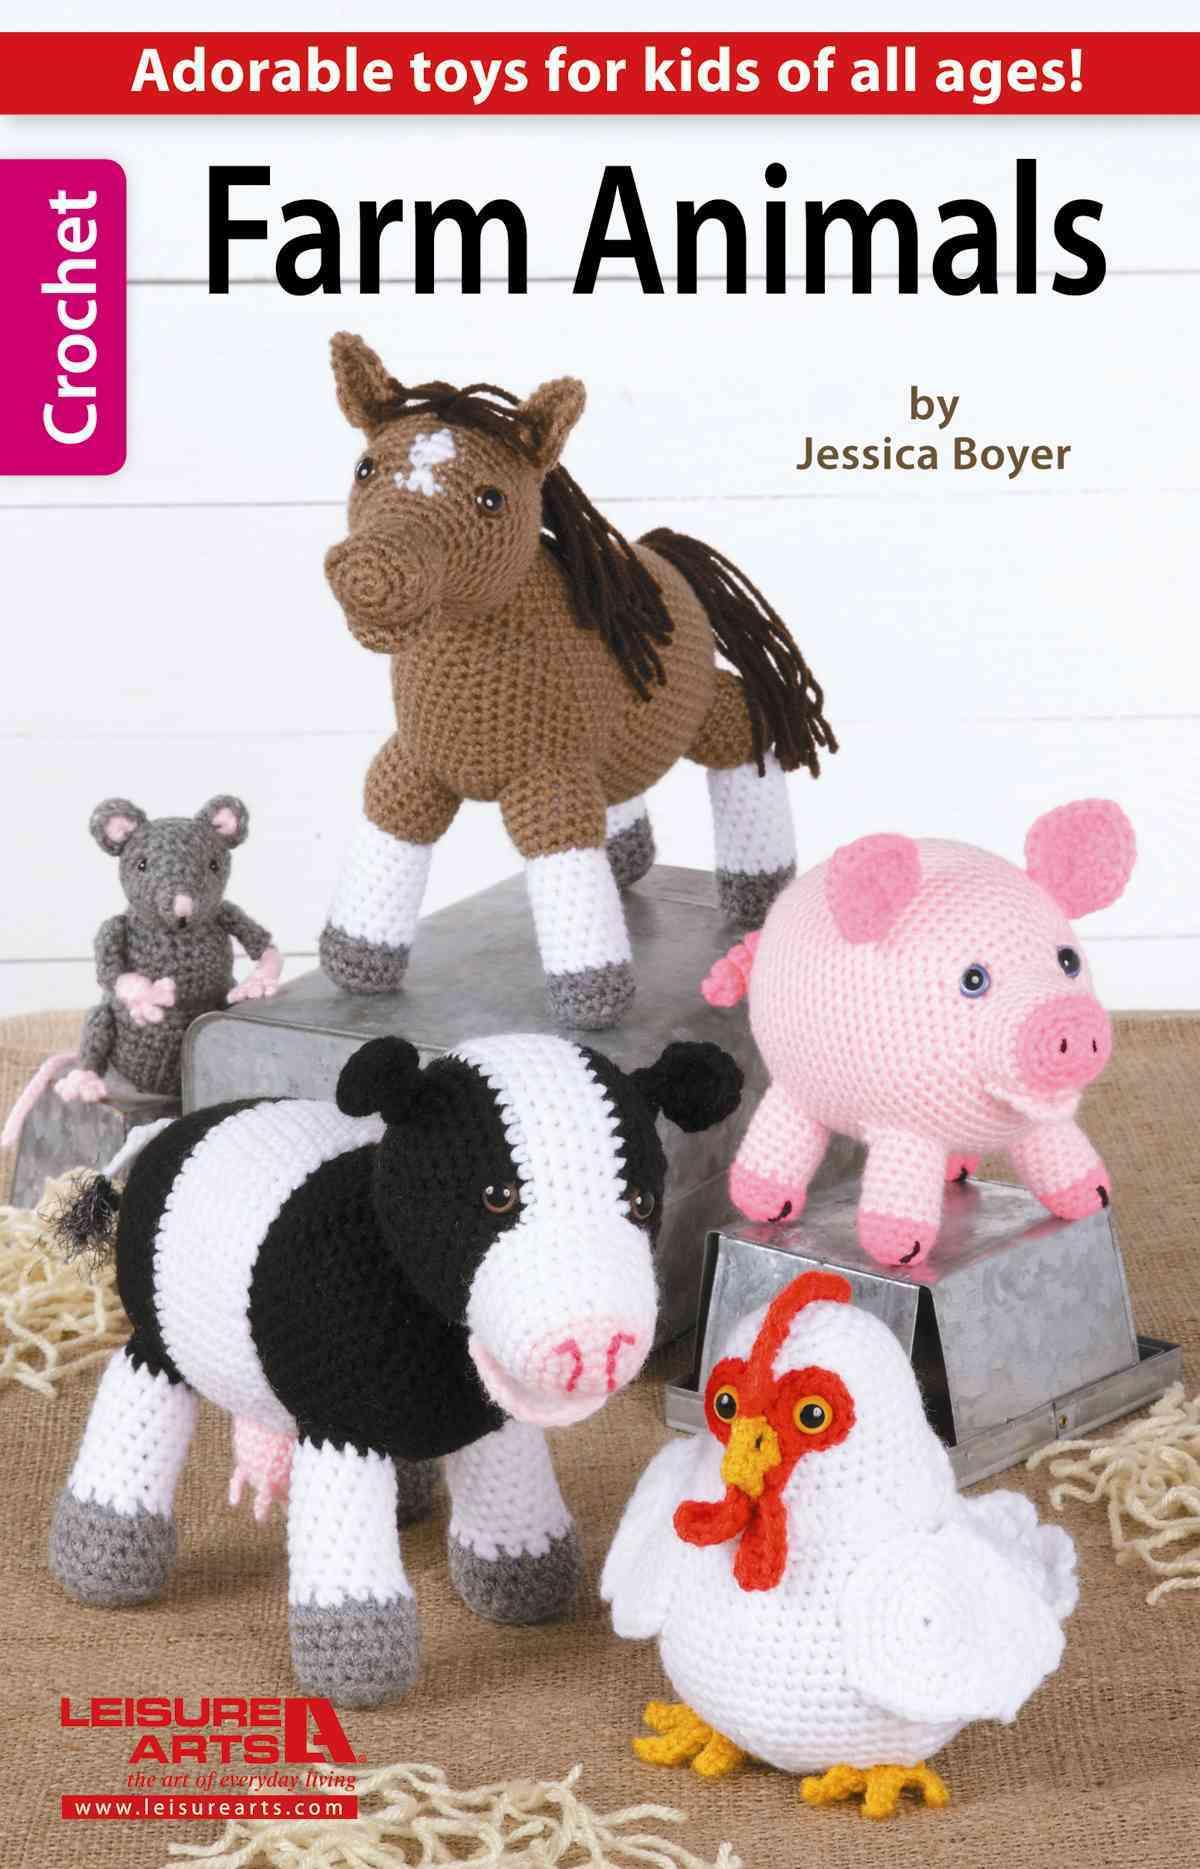 Farm Animals By Leisure Arts, Inc.